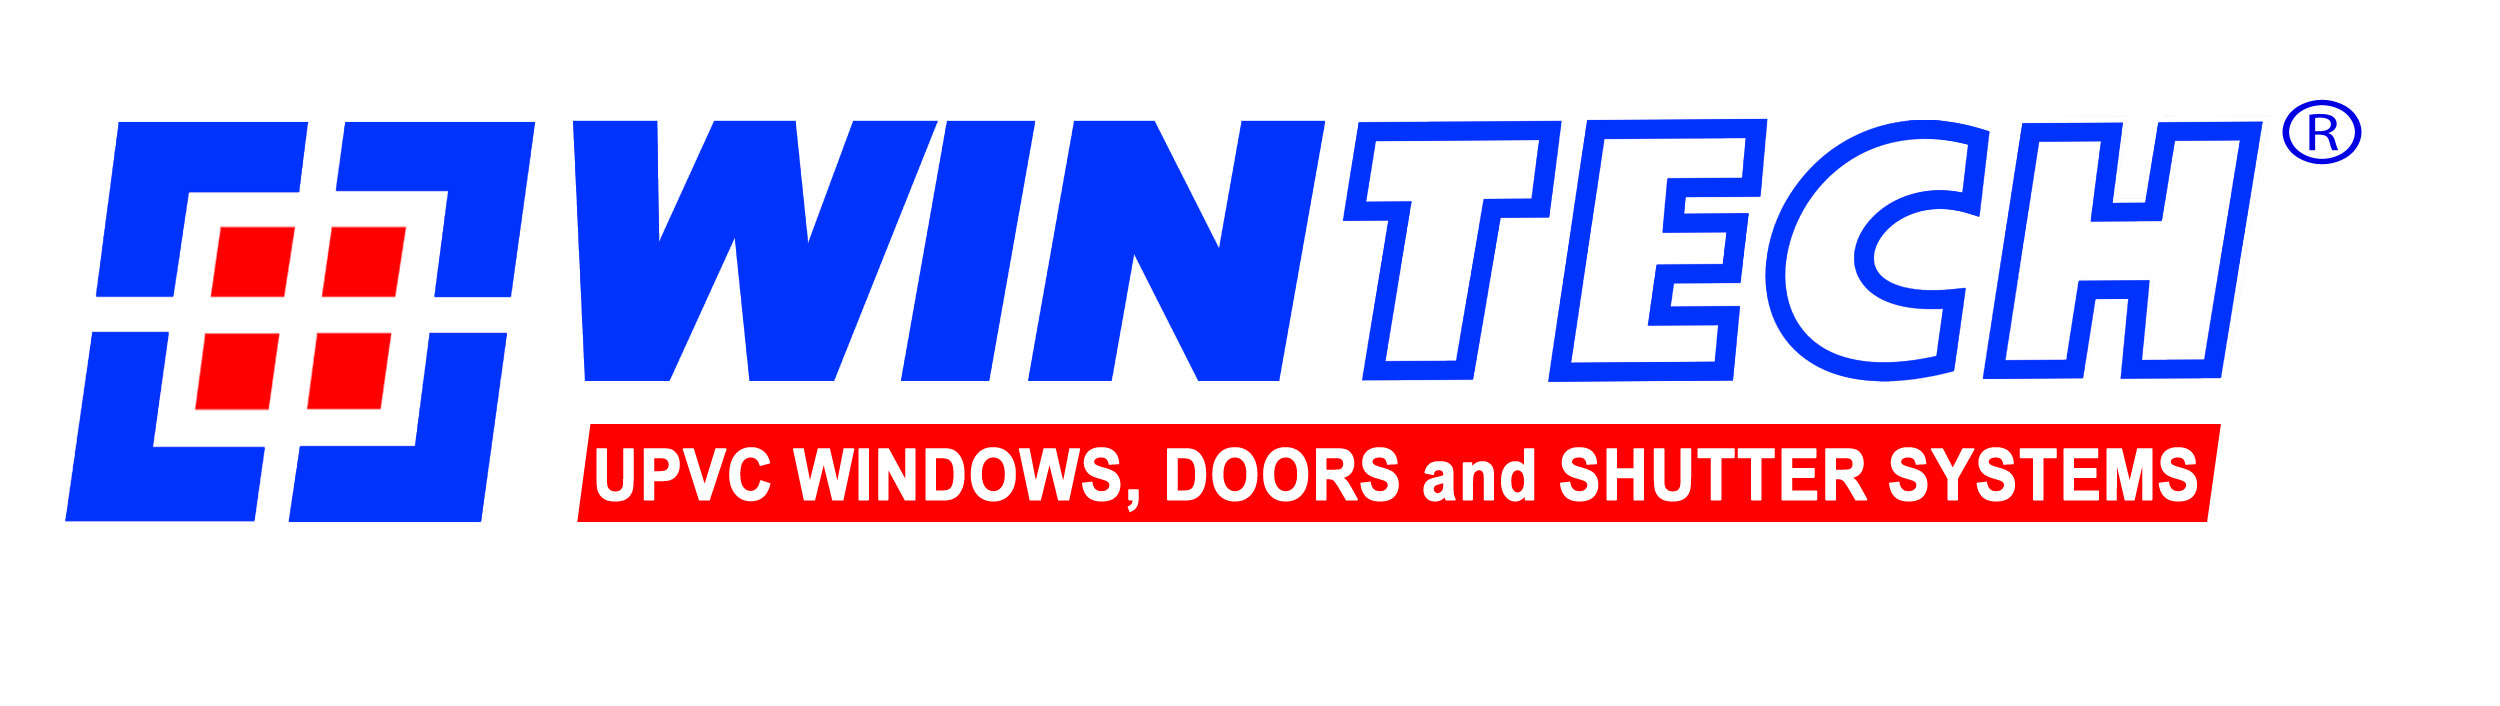 وین تک  پنجره یک